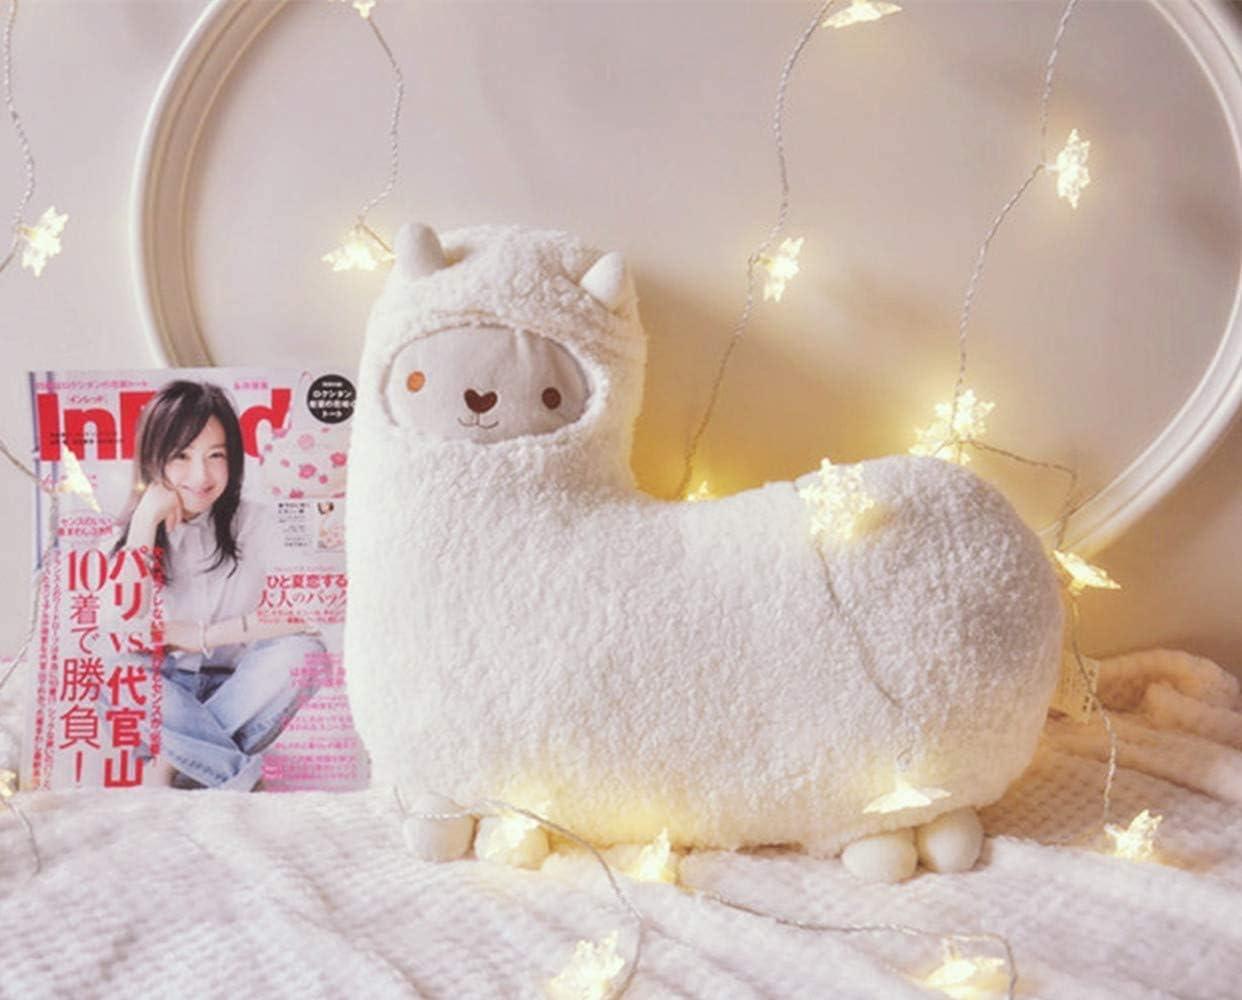 Beige Ryouda Baby Stuffed Animals Aunt Merry Mokomoko Llama Alpaca Hug Pillow Cushion Doll